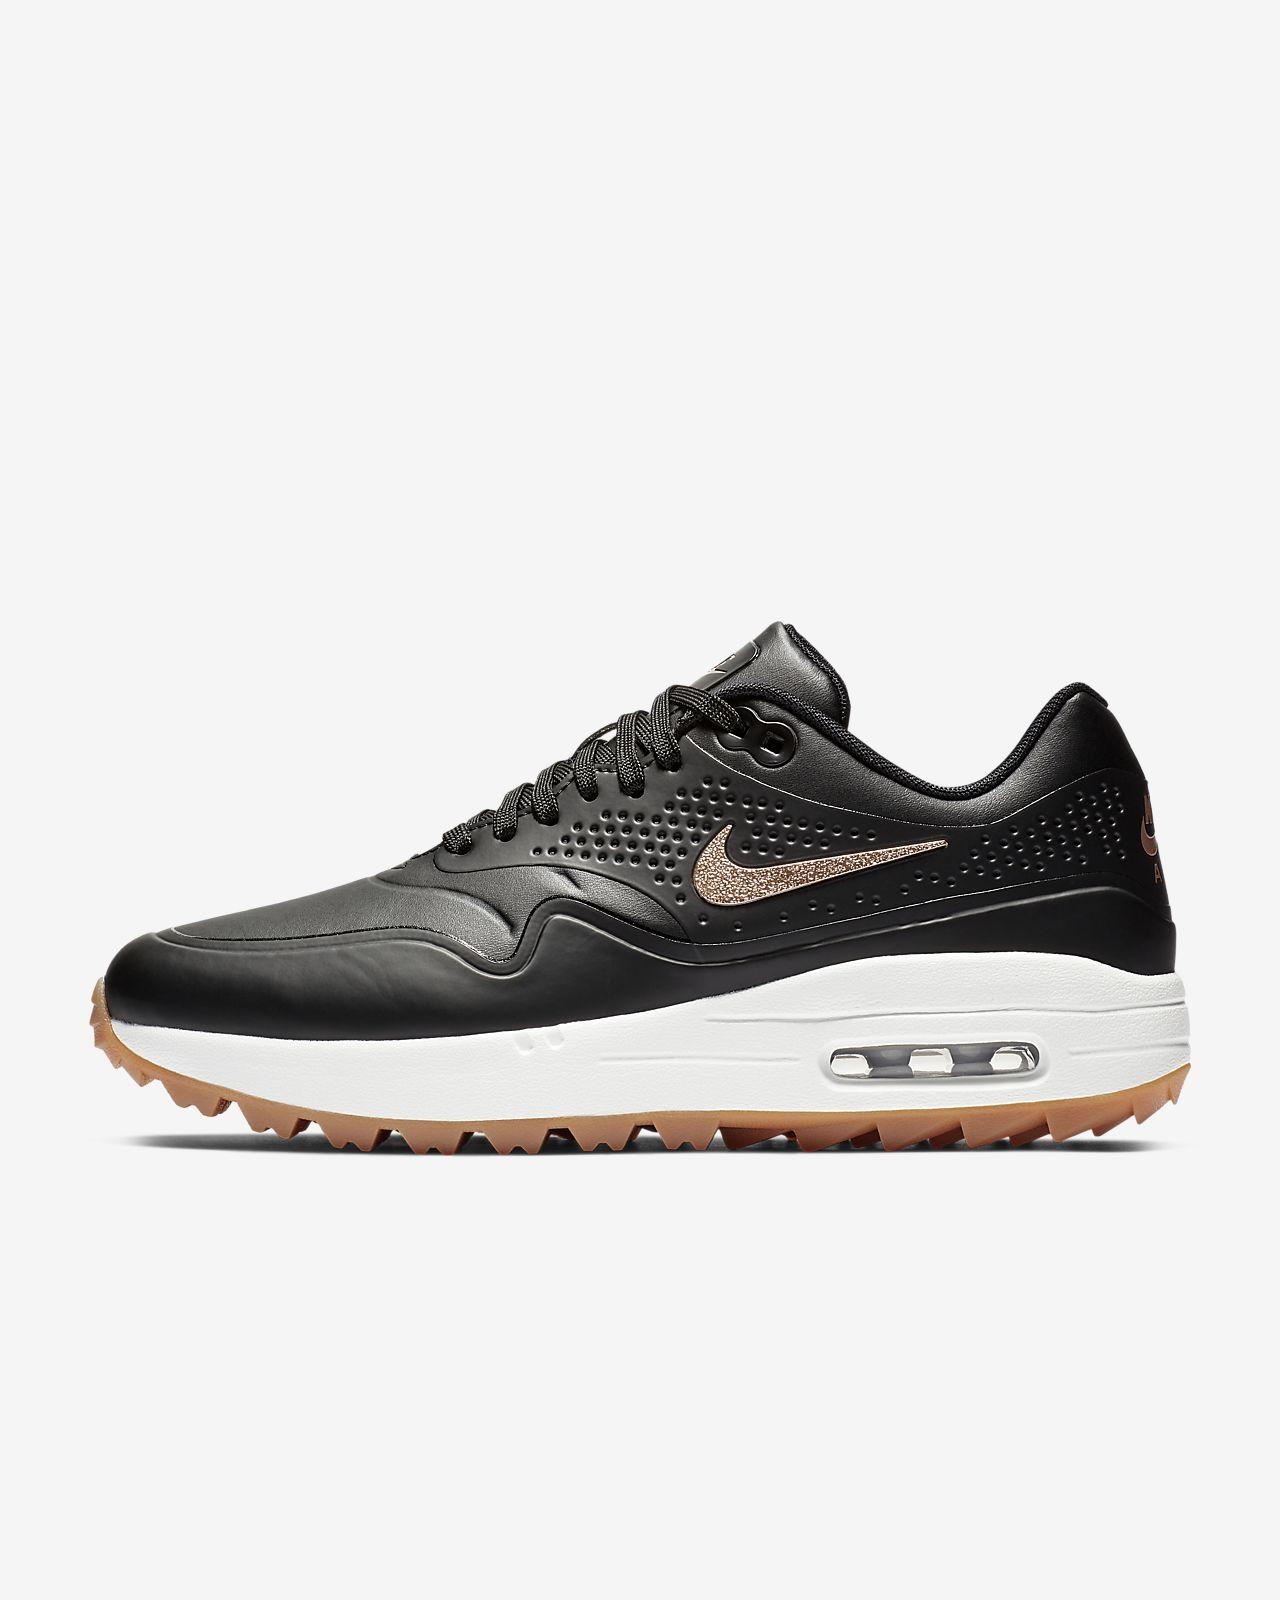 Nike Air Max 1 G-golfsko til kvinder